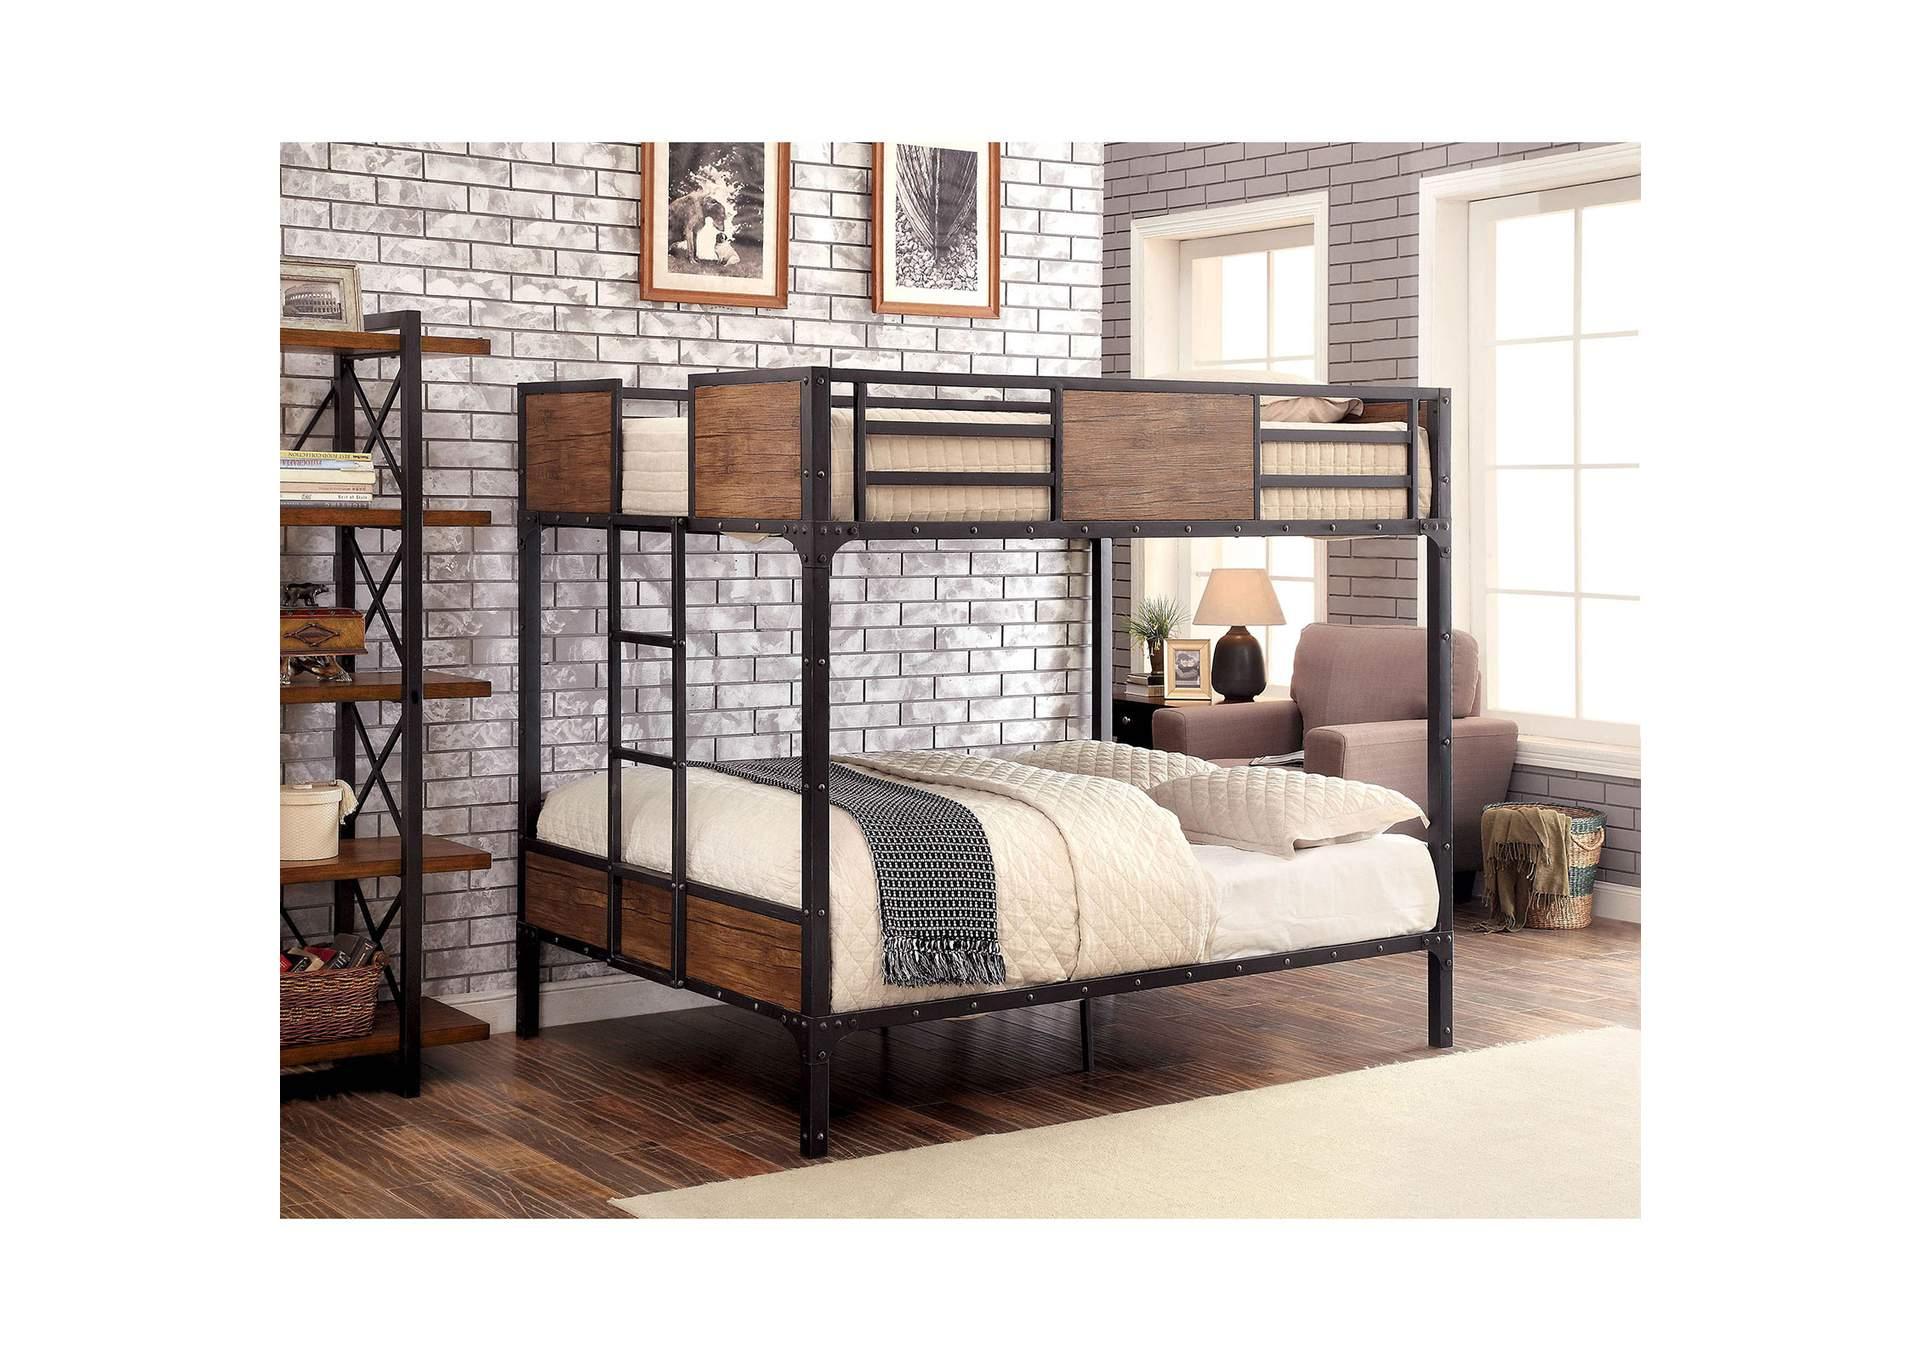 Furniture ville bronx ny clapton black full full bunk bed for Furniture ville